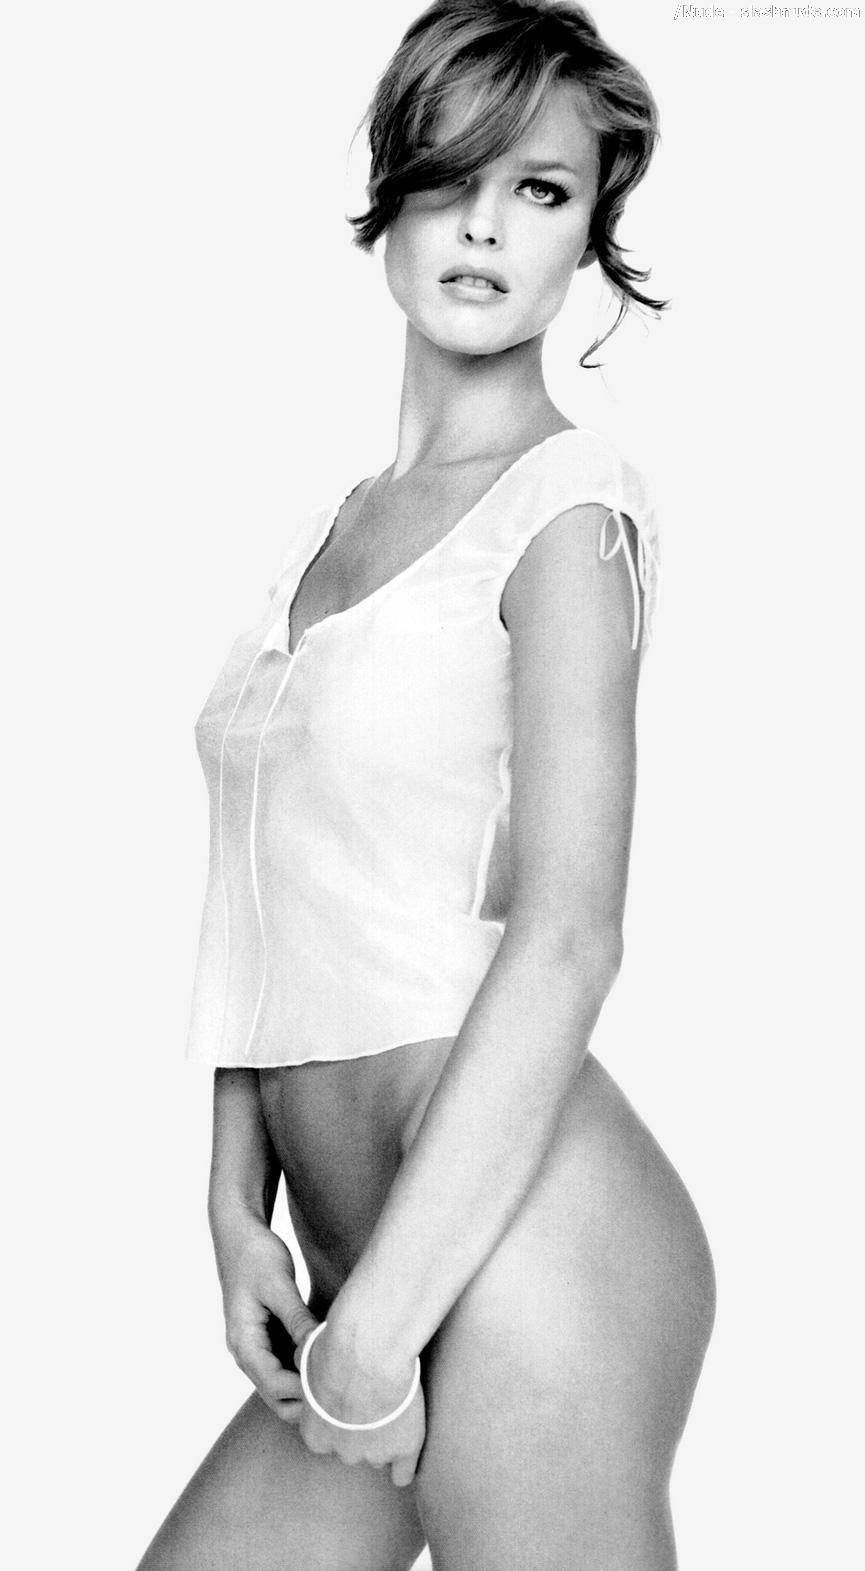 eva herzigova nude in black and white for elle - photo 5 - /nude